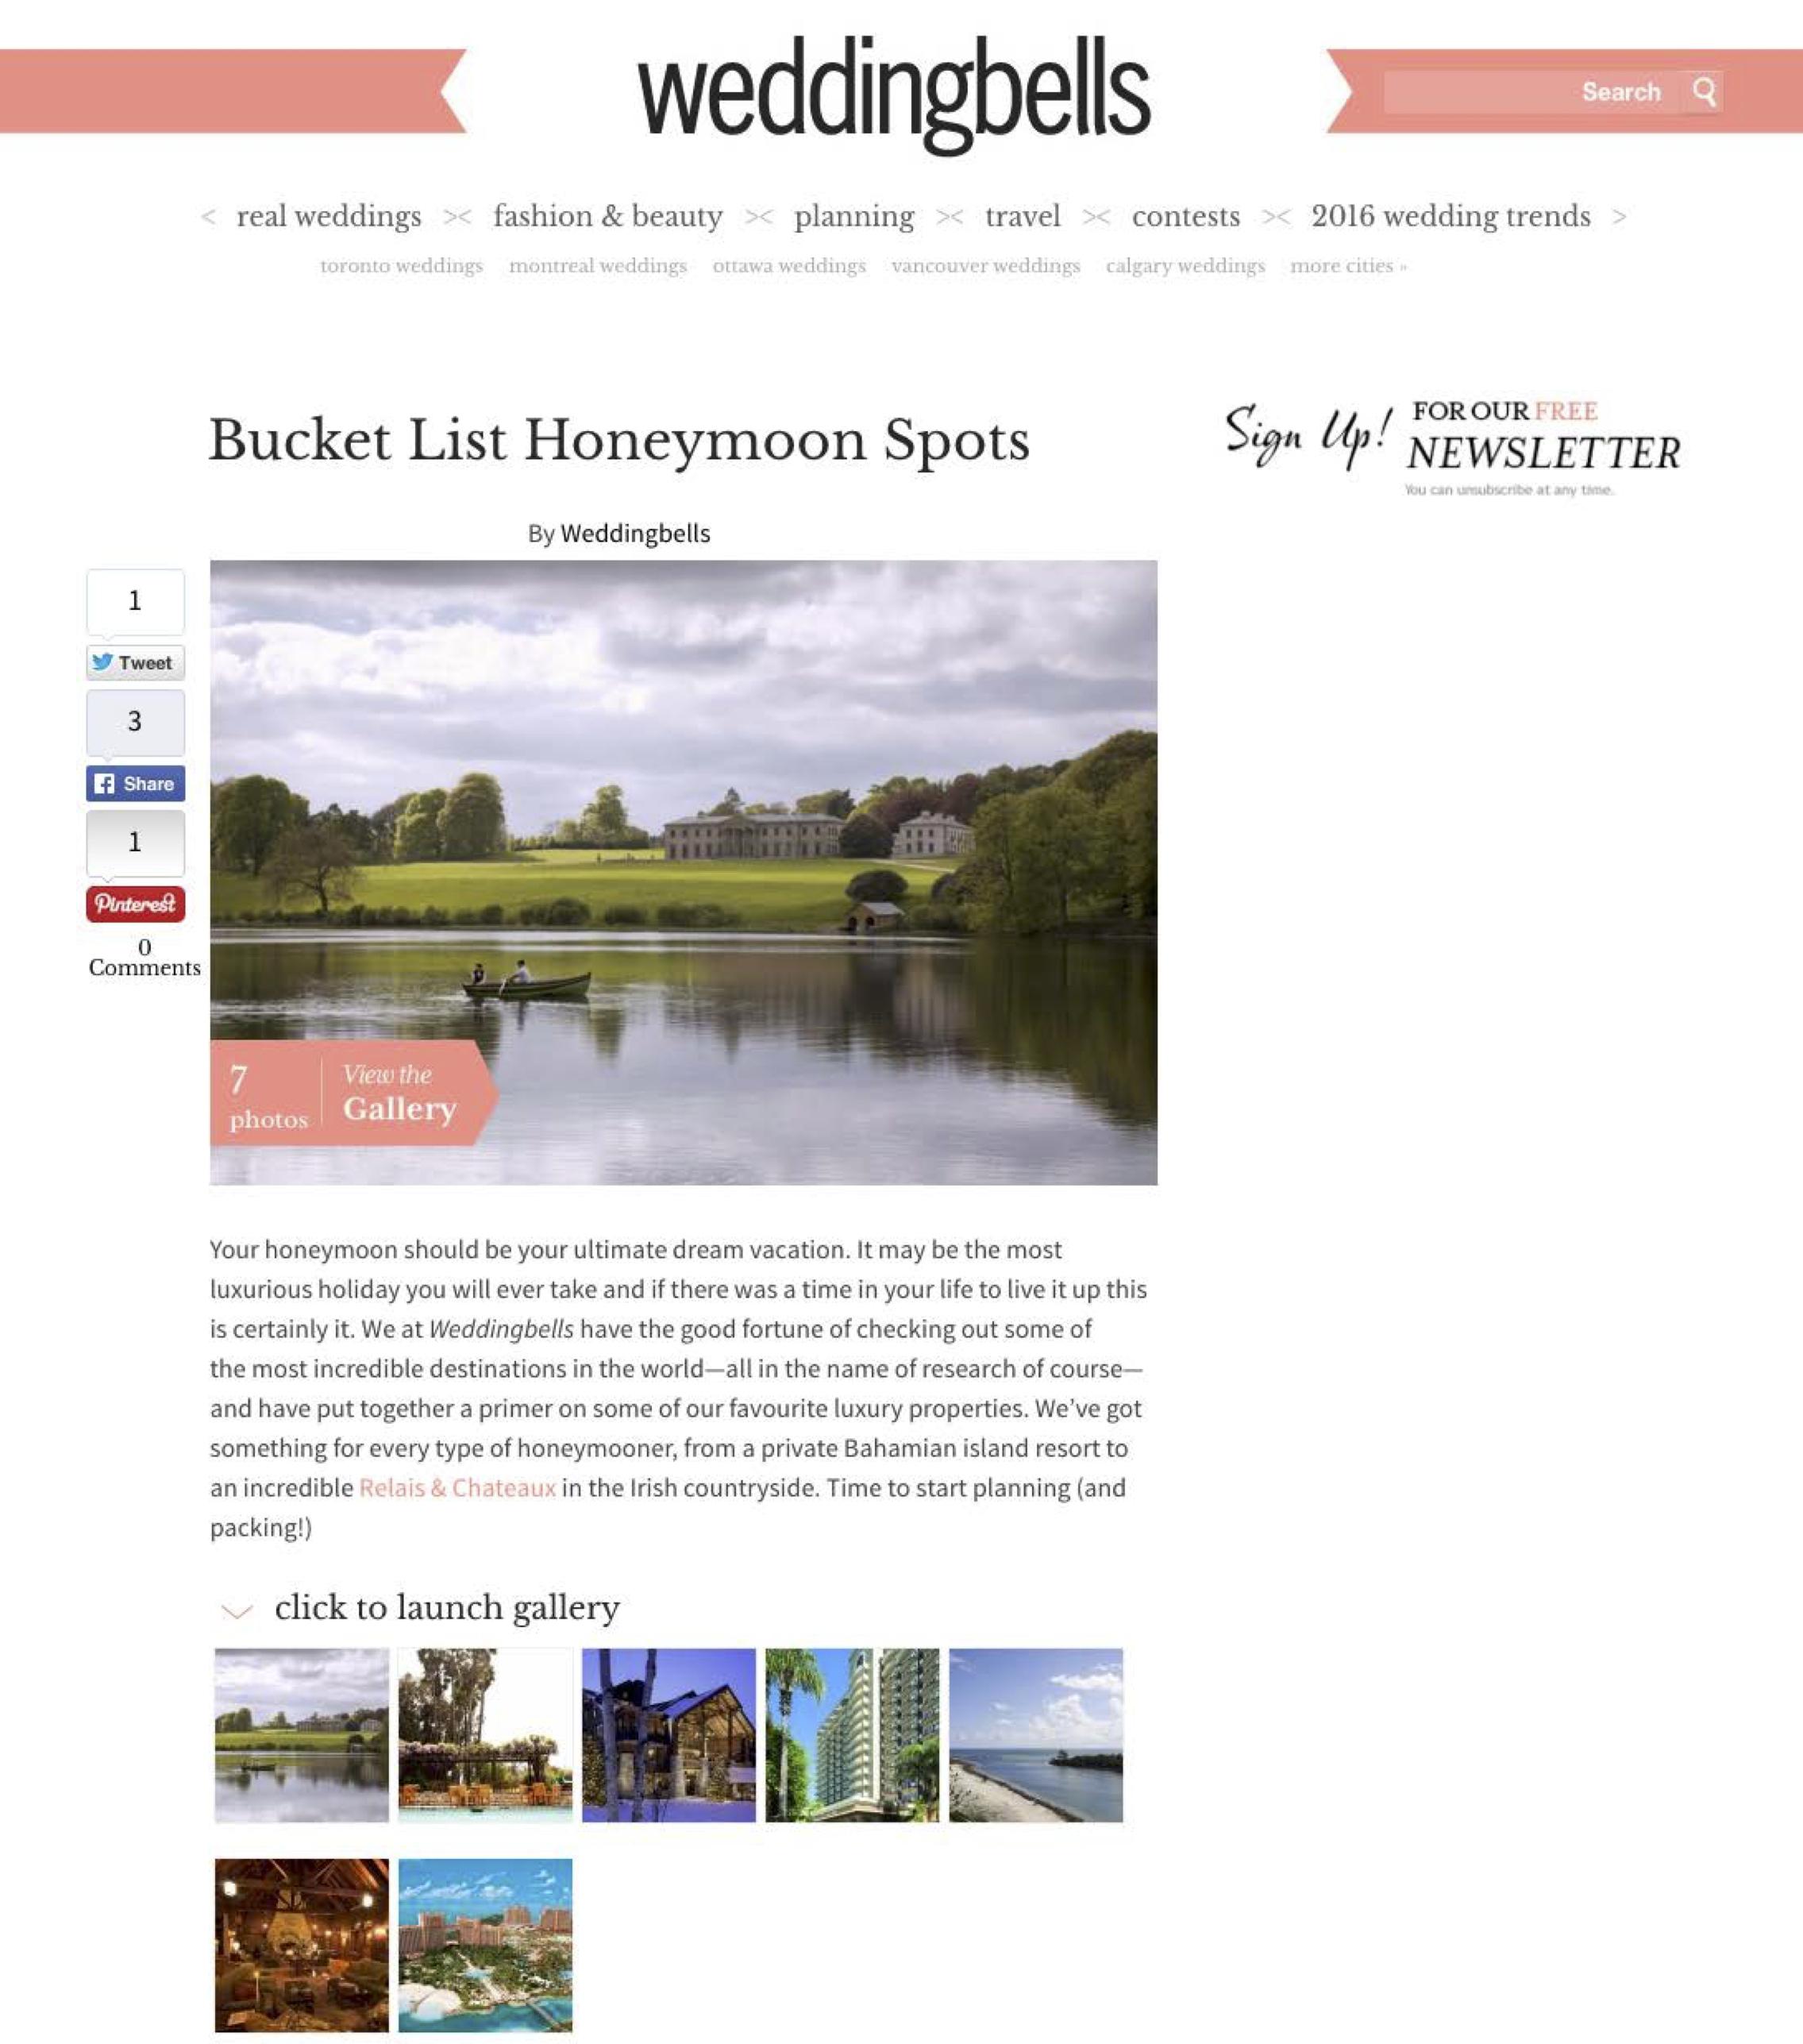 Bucket List Honeymoon Spots WEDDING BELLS